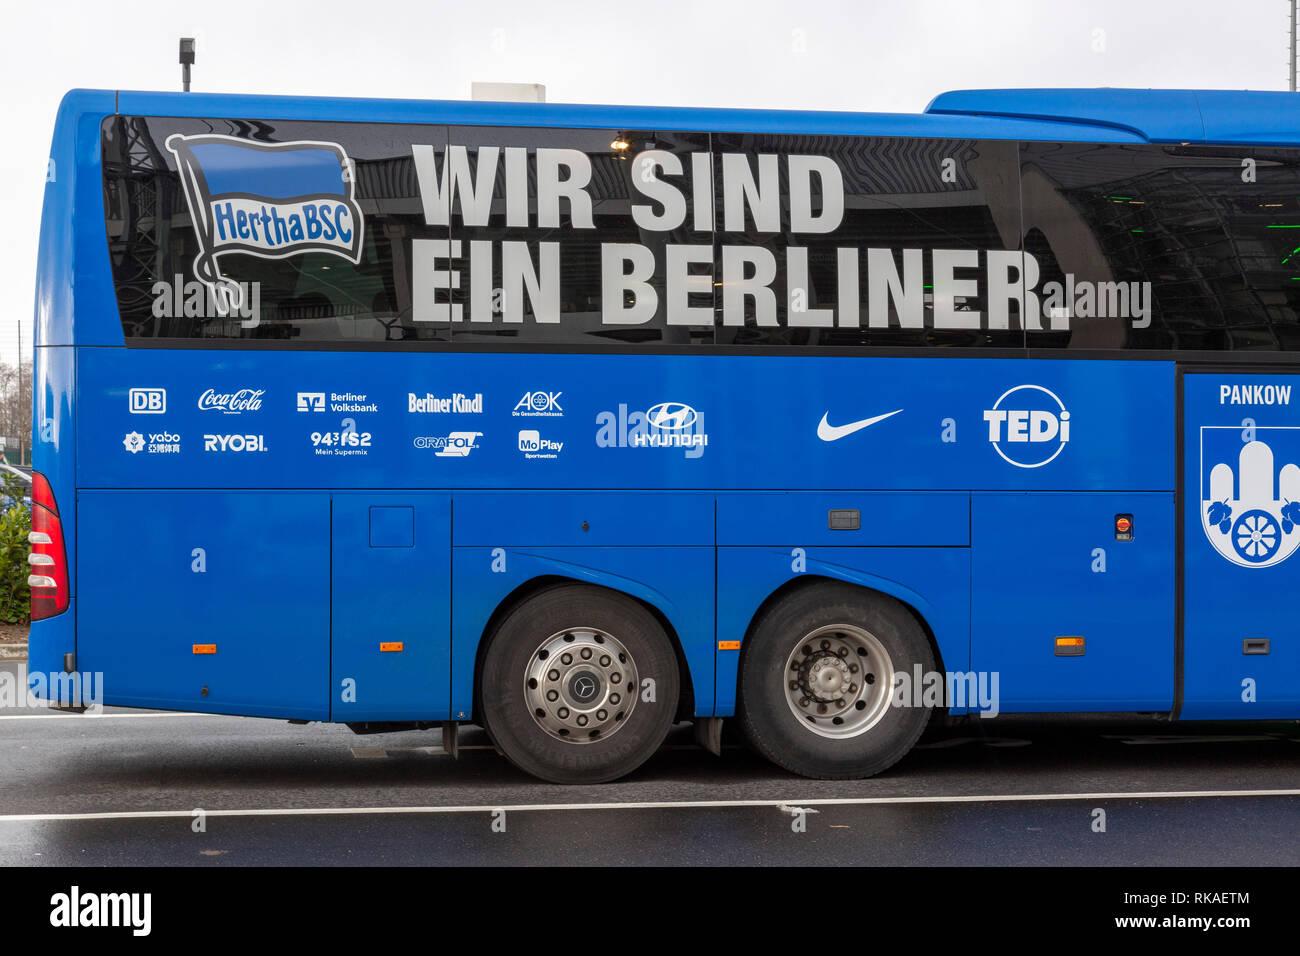 sports, football, Bundesliga, 2018/2019, Borussia Moenchengladbach vs Hertha BSC Berlin 0-3, Stadium Borussia Park, team bus Berlin, DFL REGULATIONS PROHIBIT ANY USE OF PHOTOGRAPHS AS IMAGE SEQUENCES AND/OR QUASI-VIDEO - Stock Image